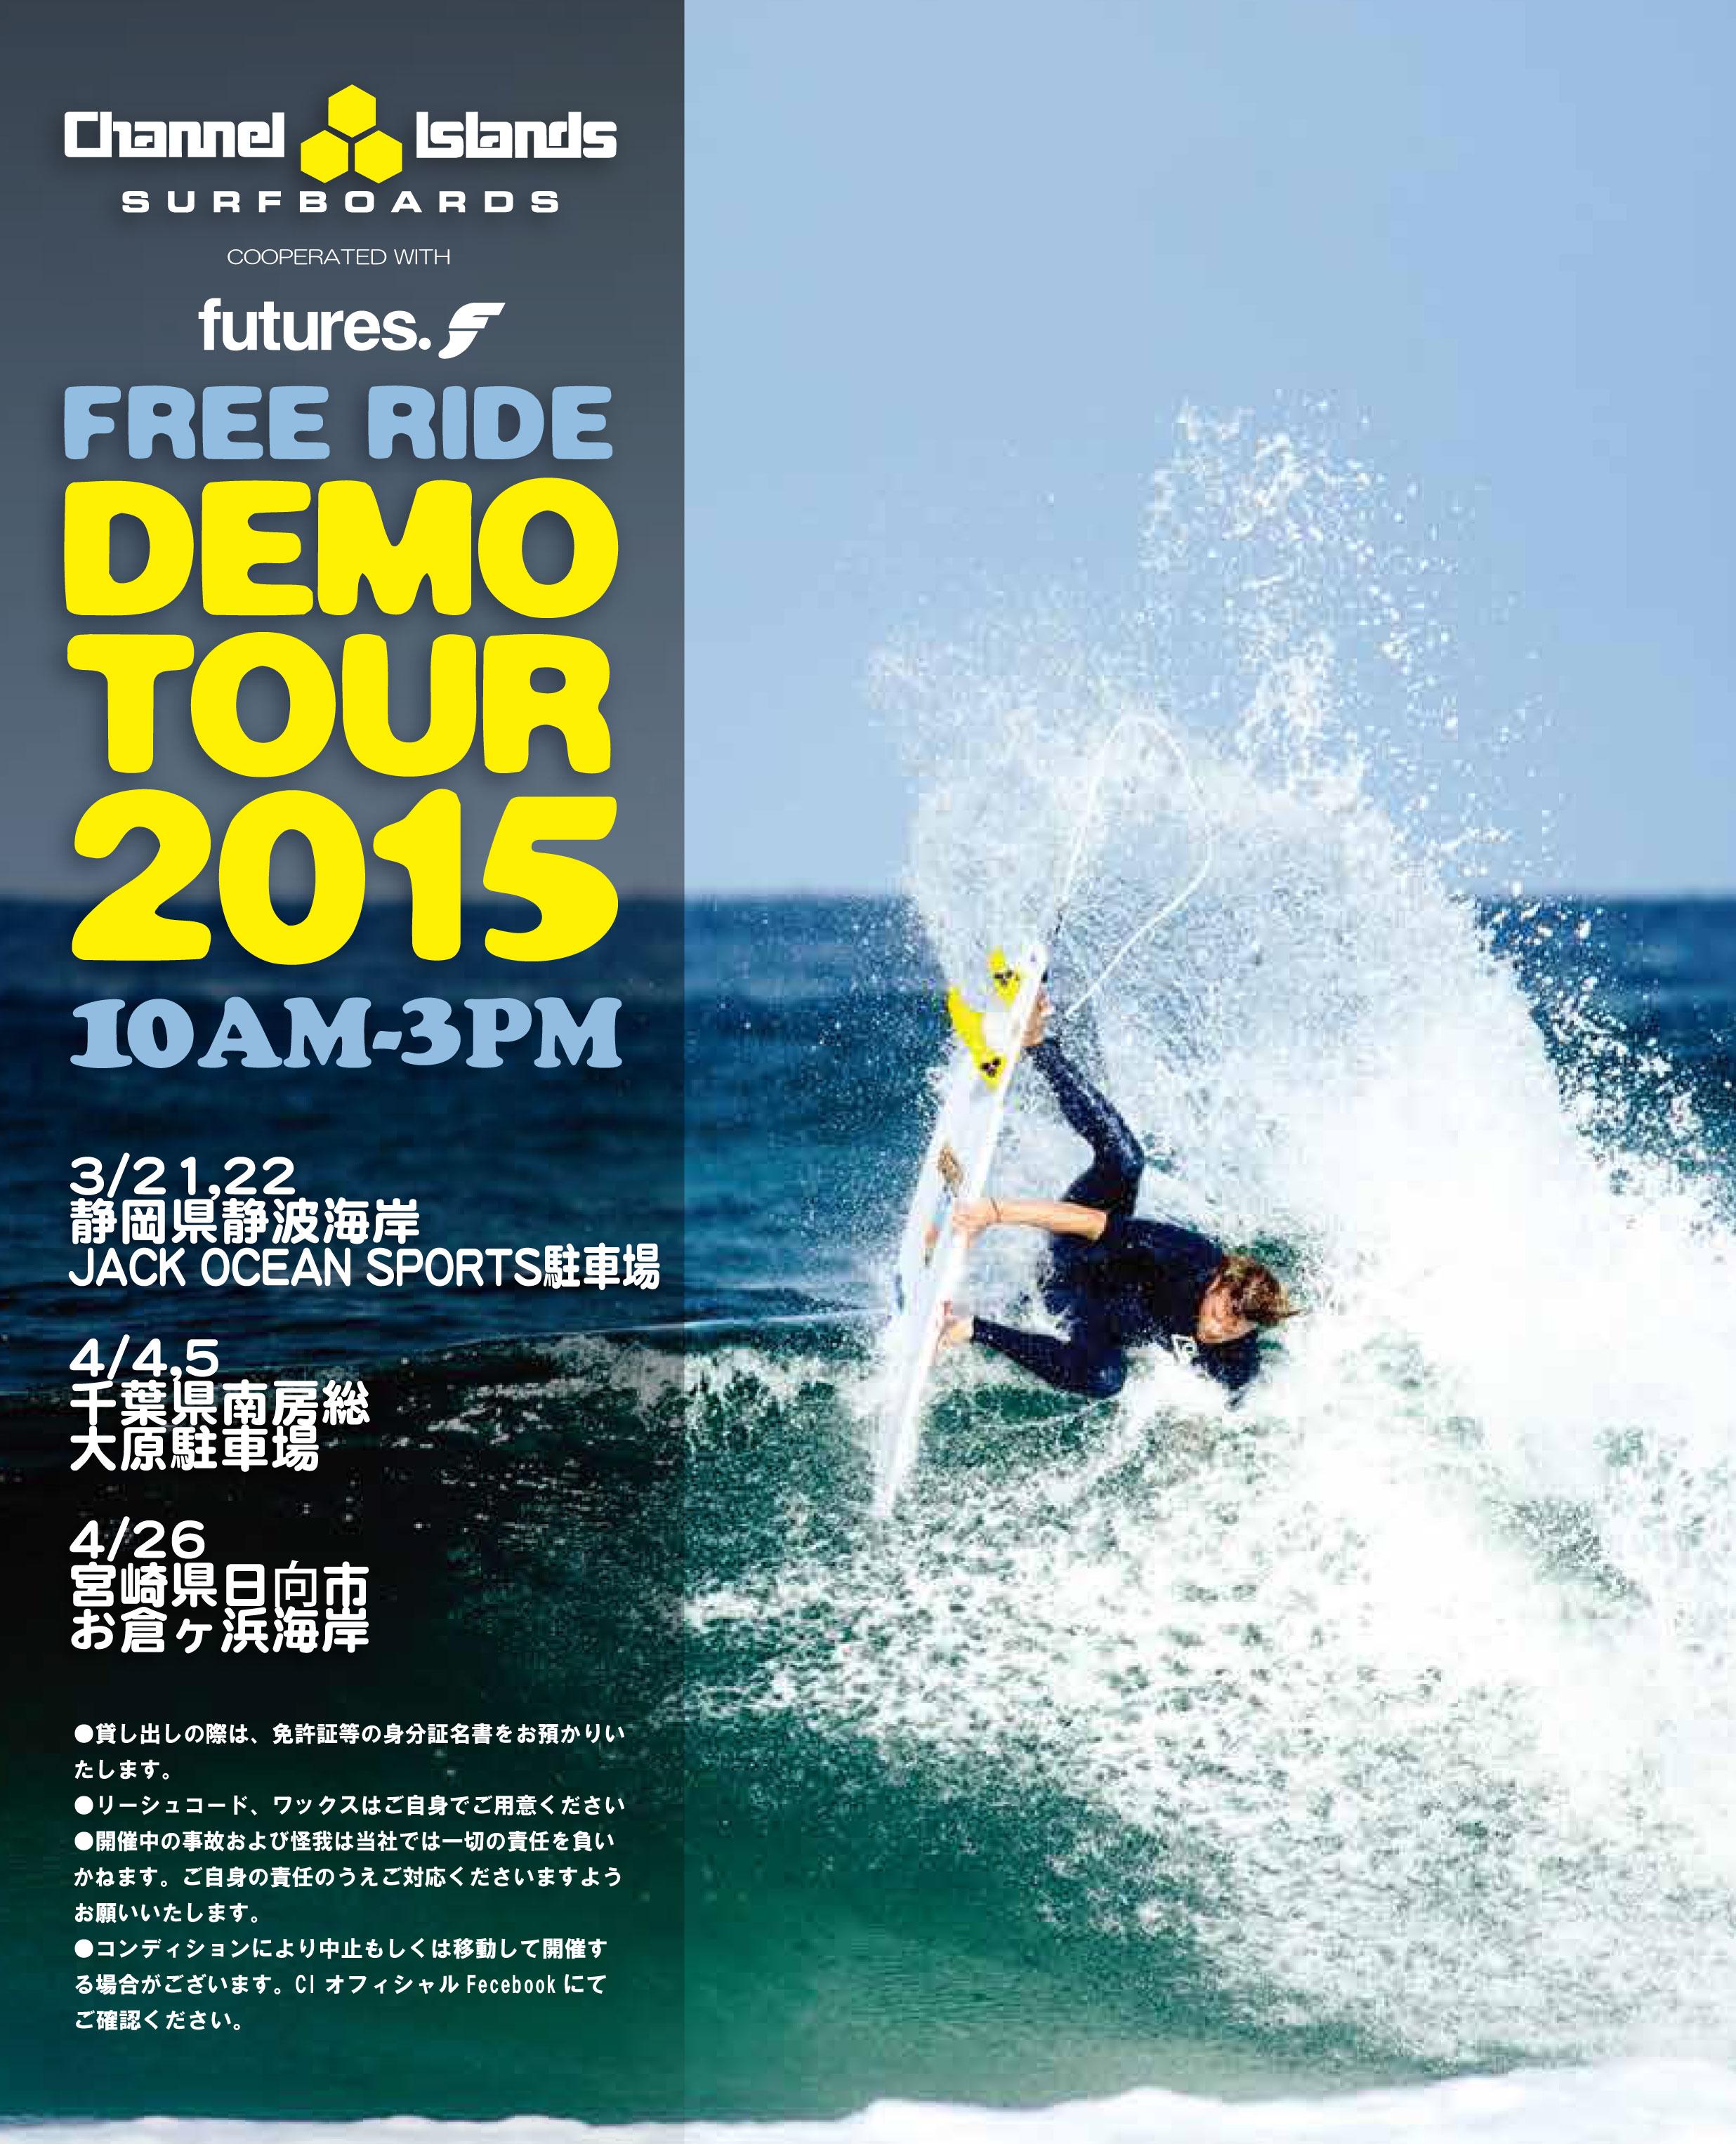 CI_DemoTour2015_JPN_1